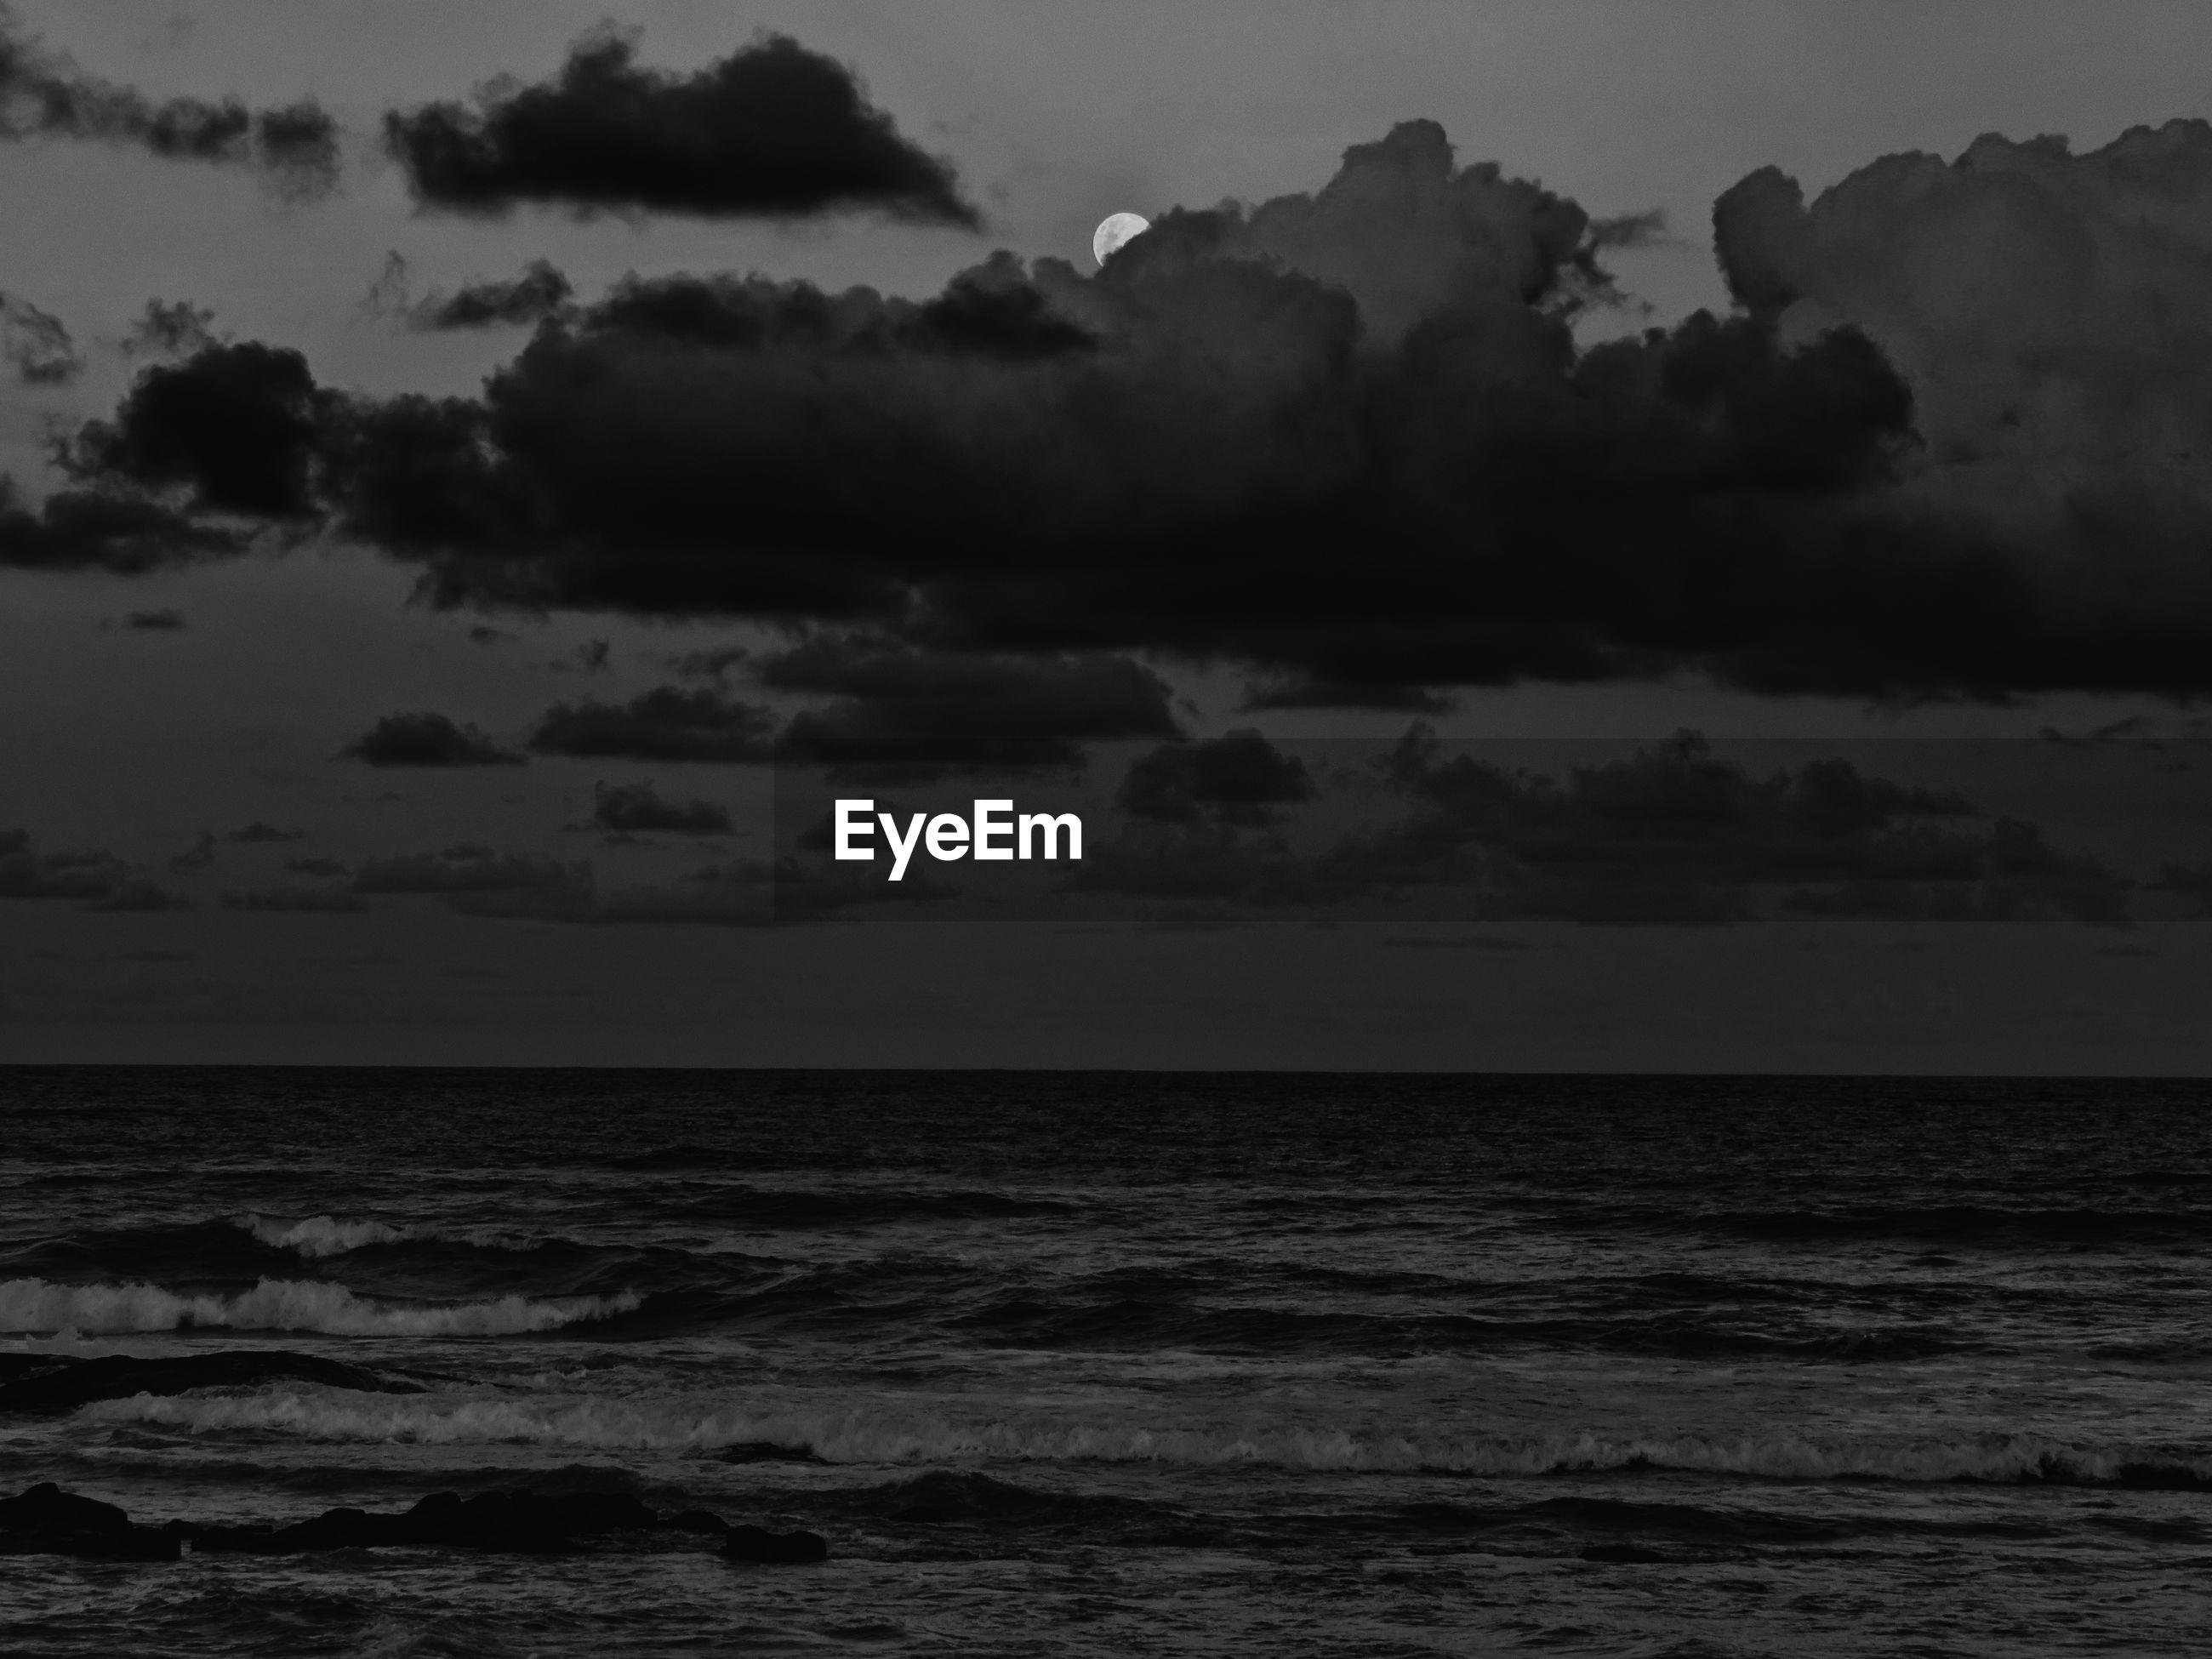 SEA AGAINST SKY